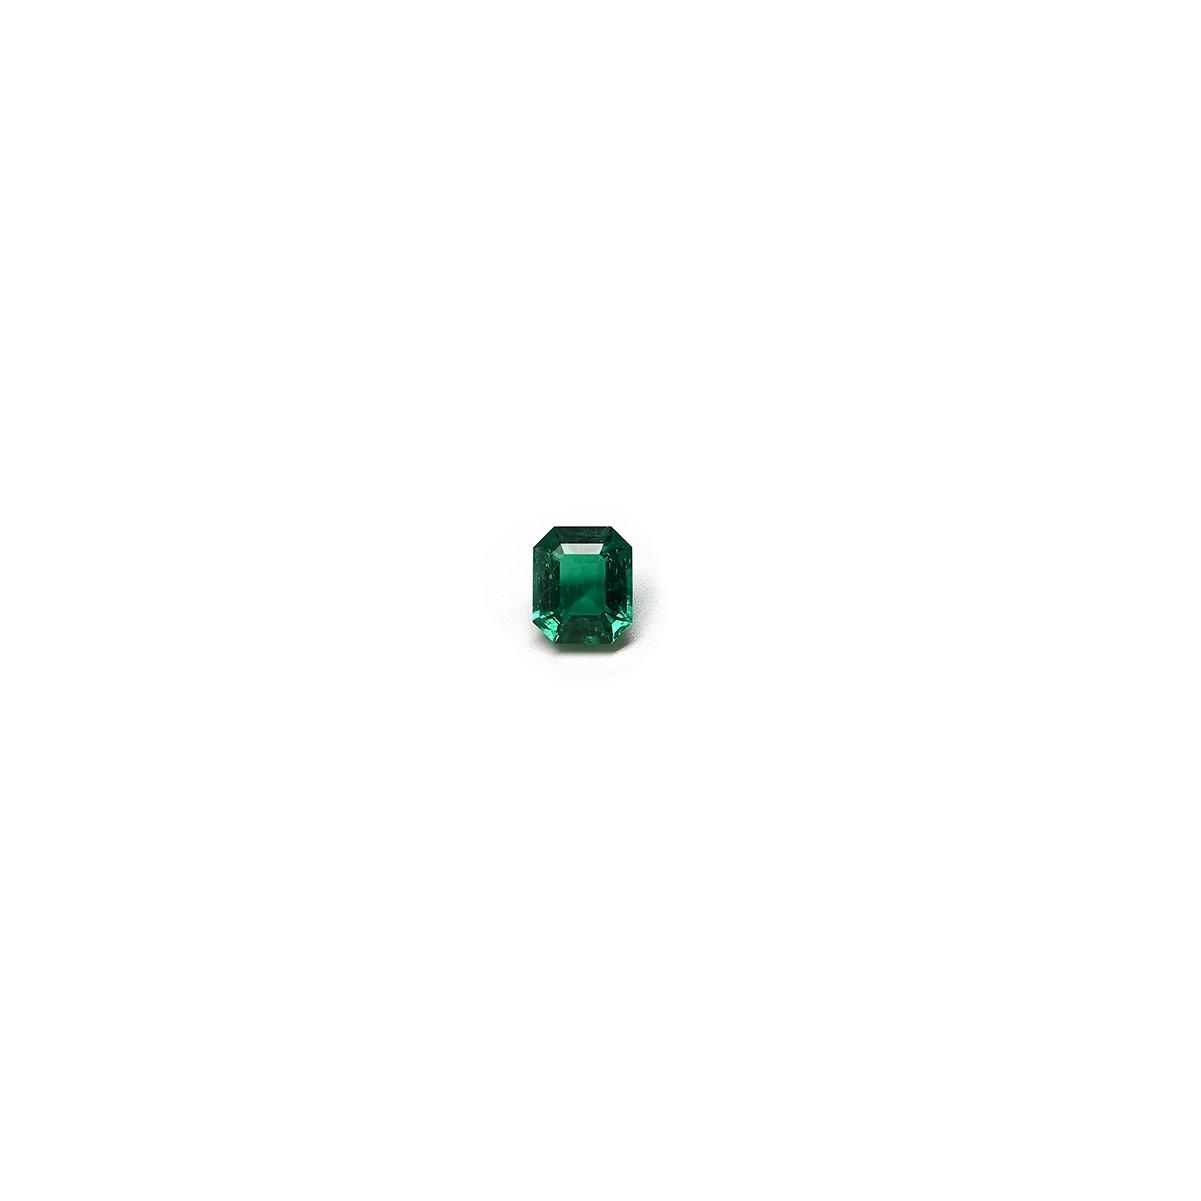 5 carat emerald cut